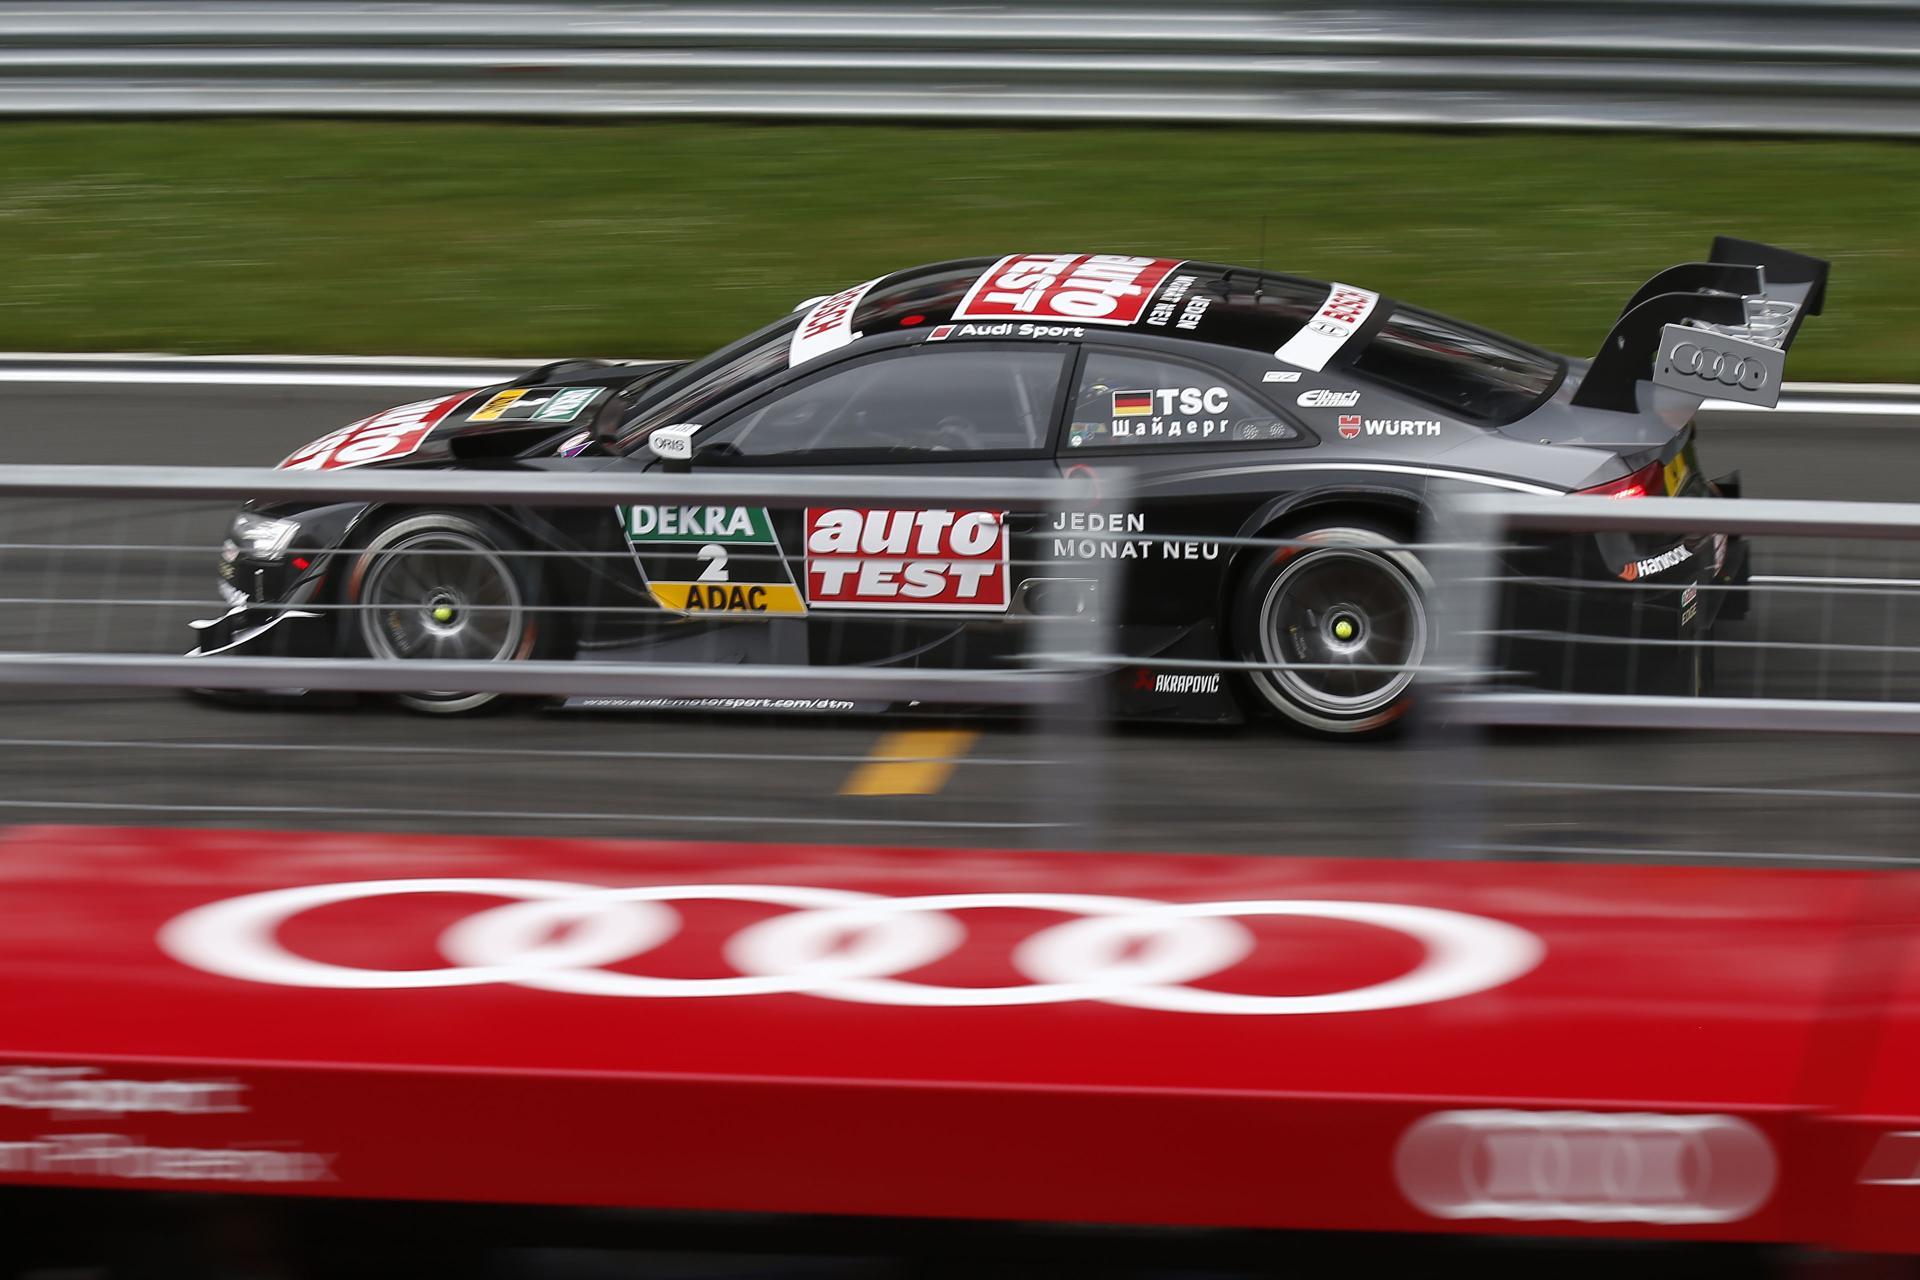 DTM pronto per il 7° round al Nurburgring